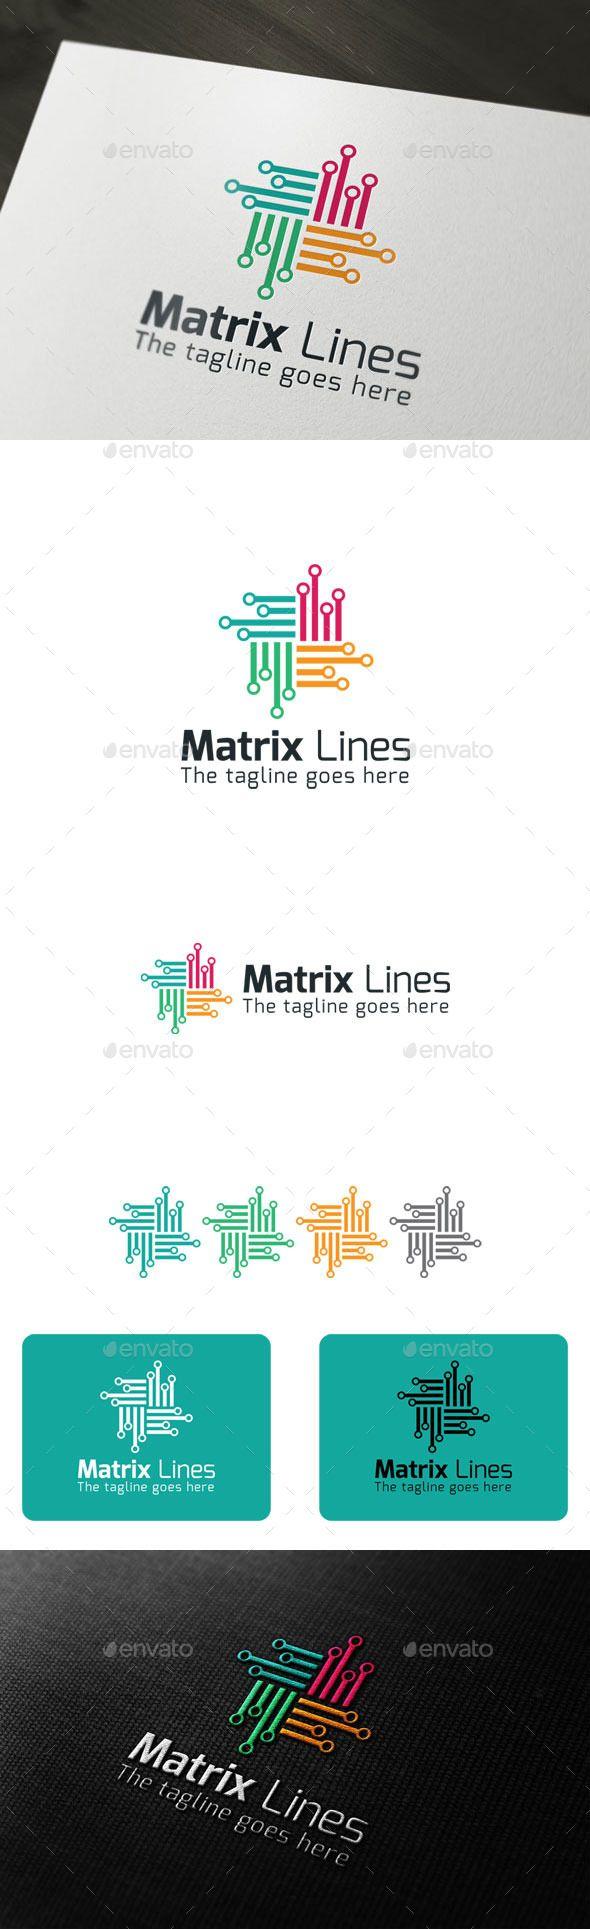 Logosmartz custom logo maker 5 0 review and download - Matrix Lines Logo Design Template Vector Logotype Download It Here Http